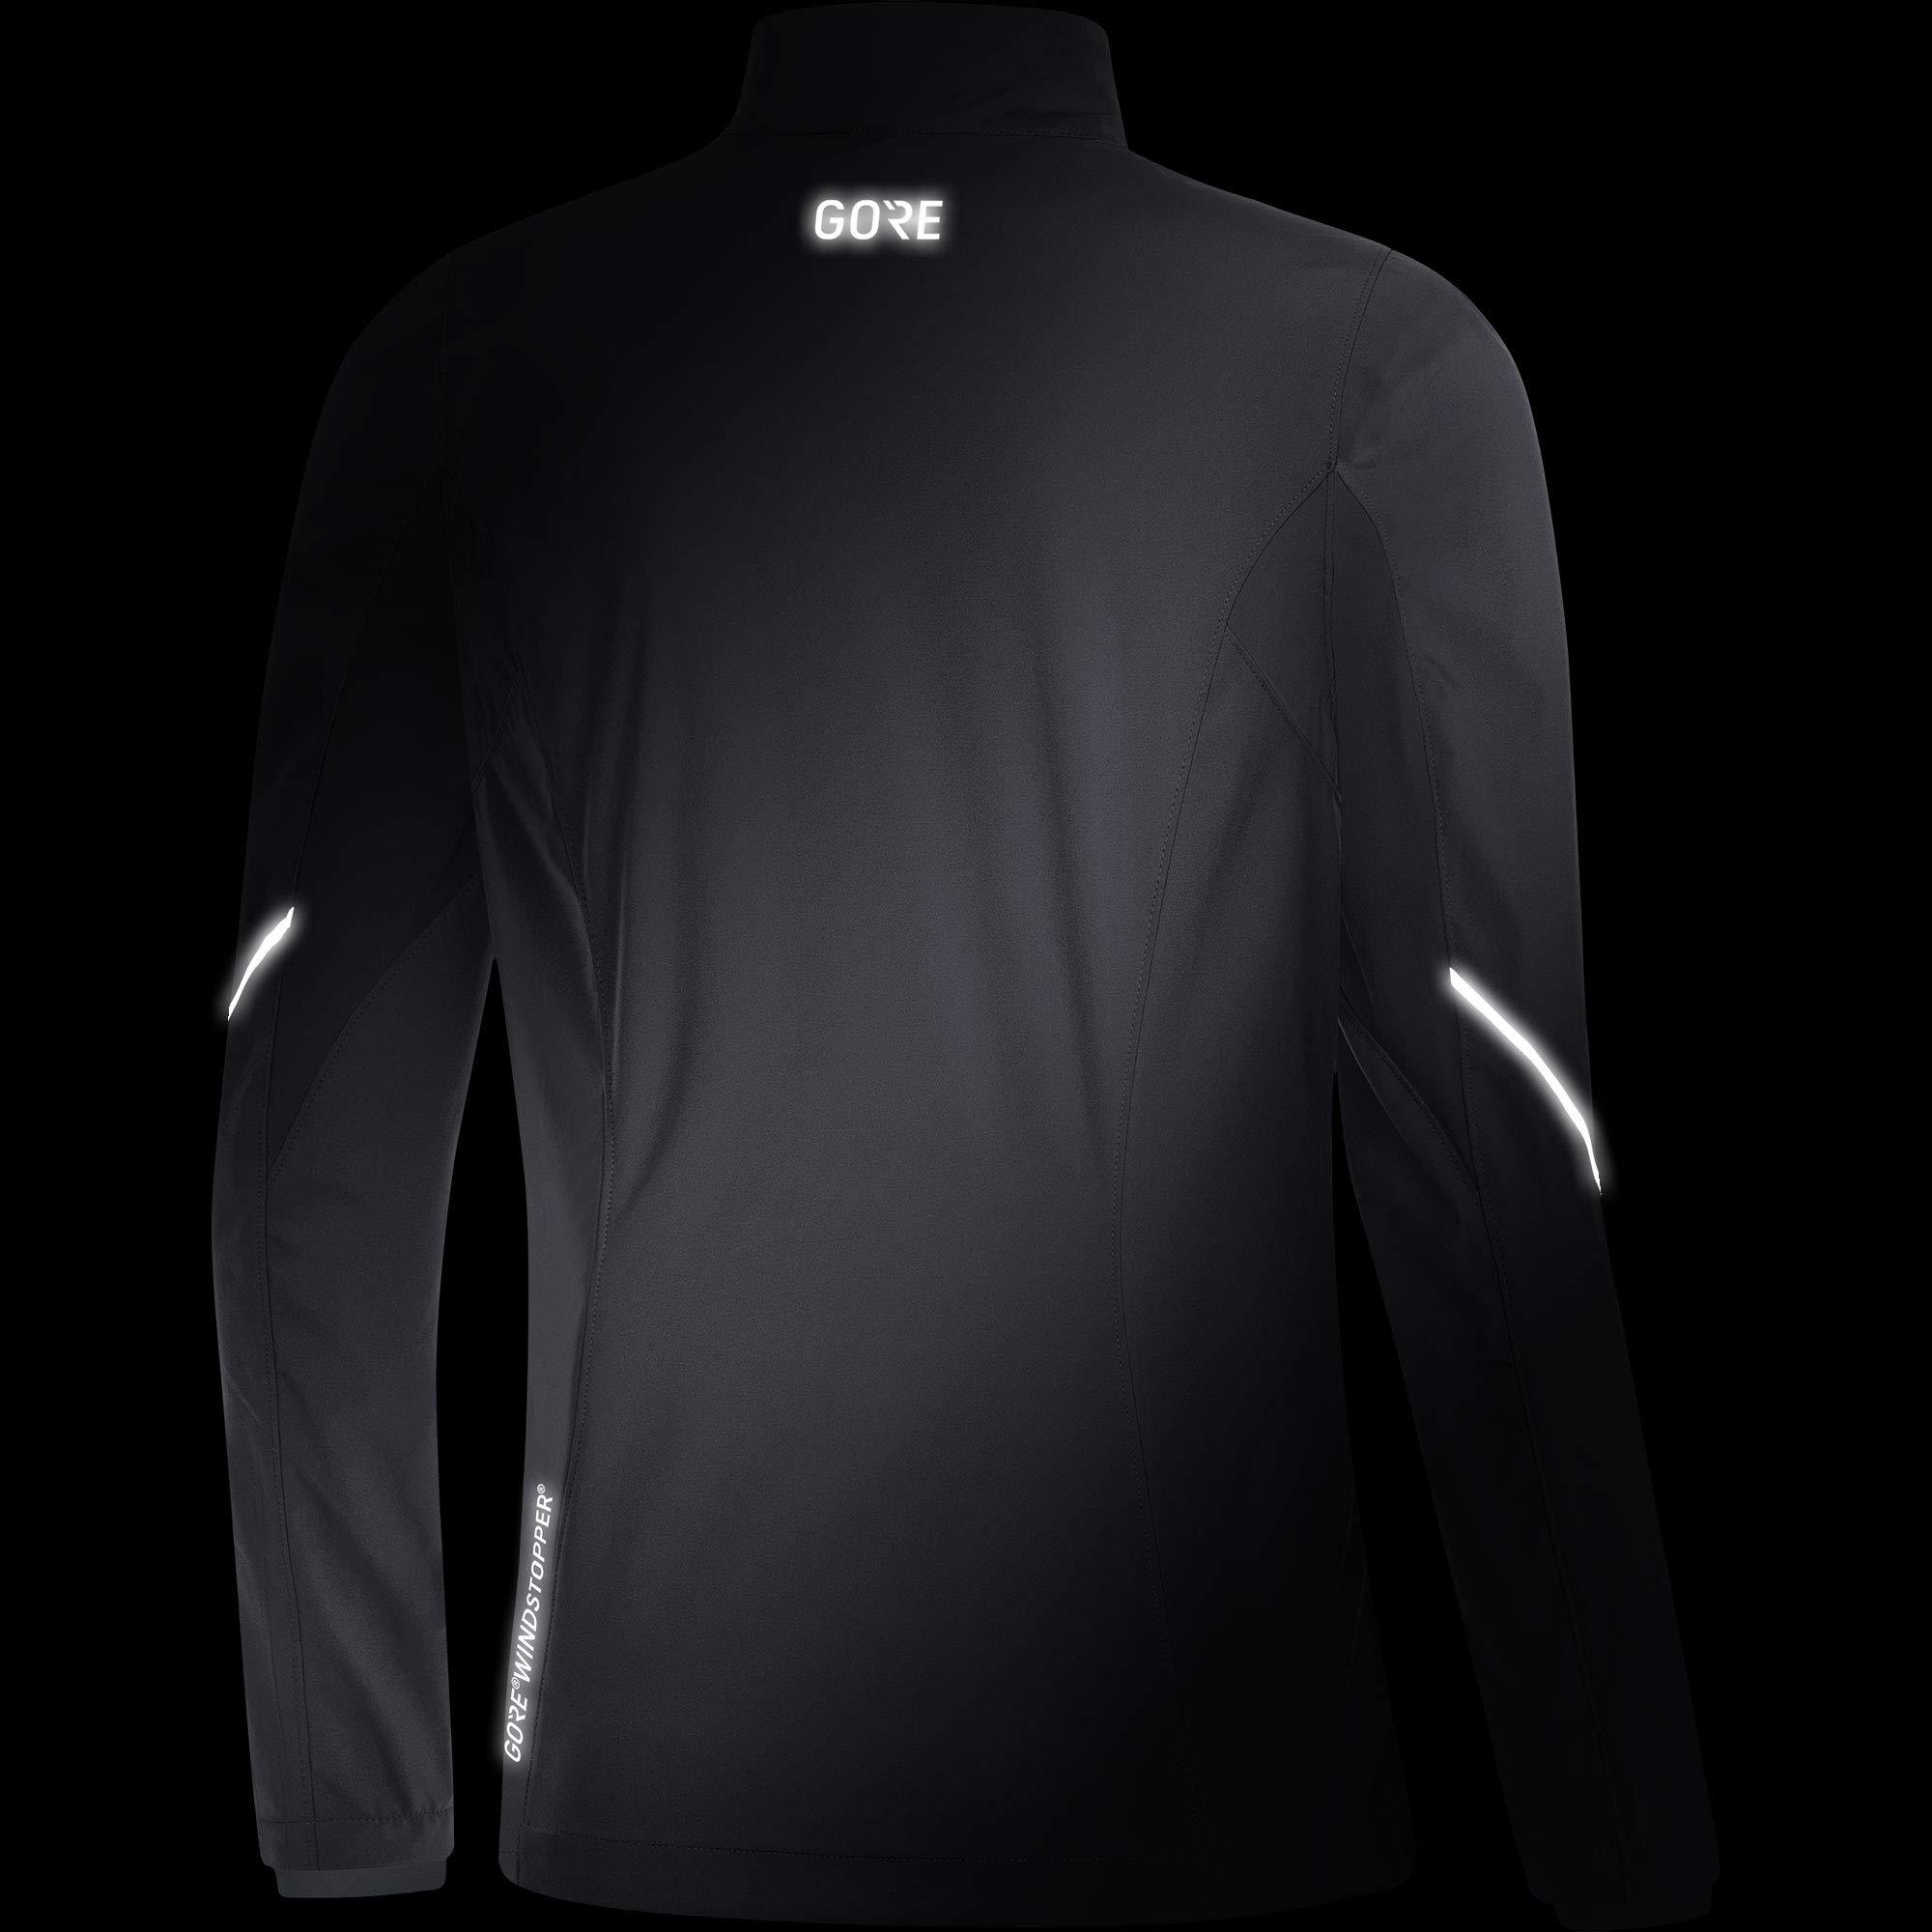 Gore Women's R3 Wmn Partial Gws Jacket,  terra grey/black,  M by GORE WEAR (Image #5)